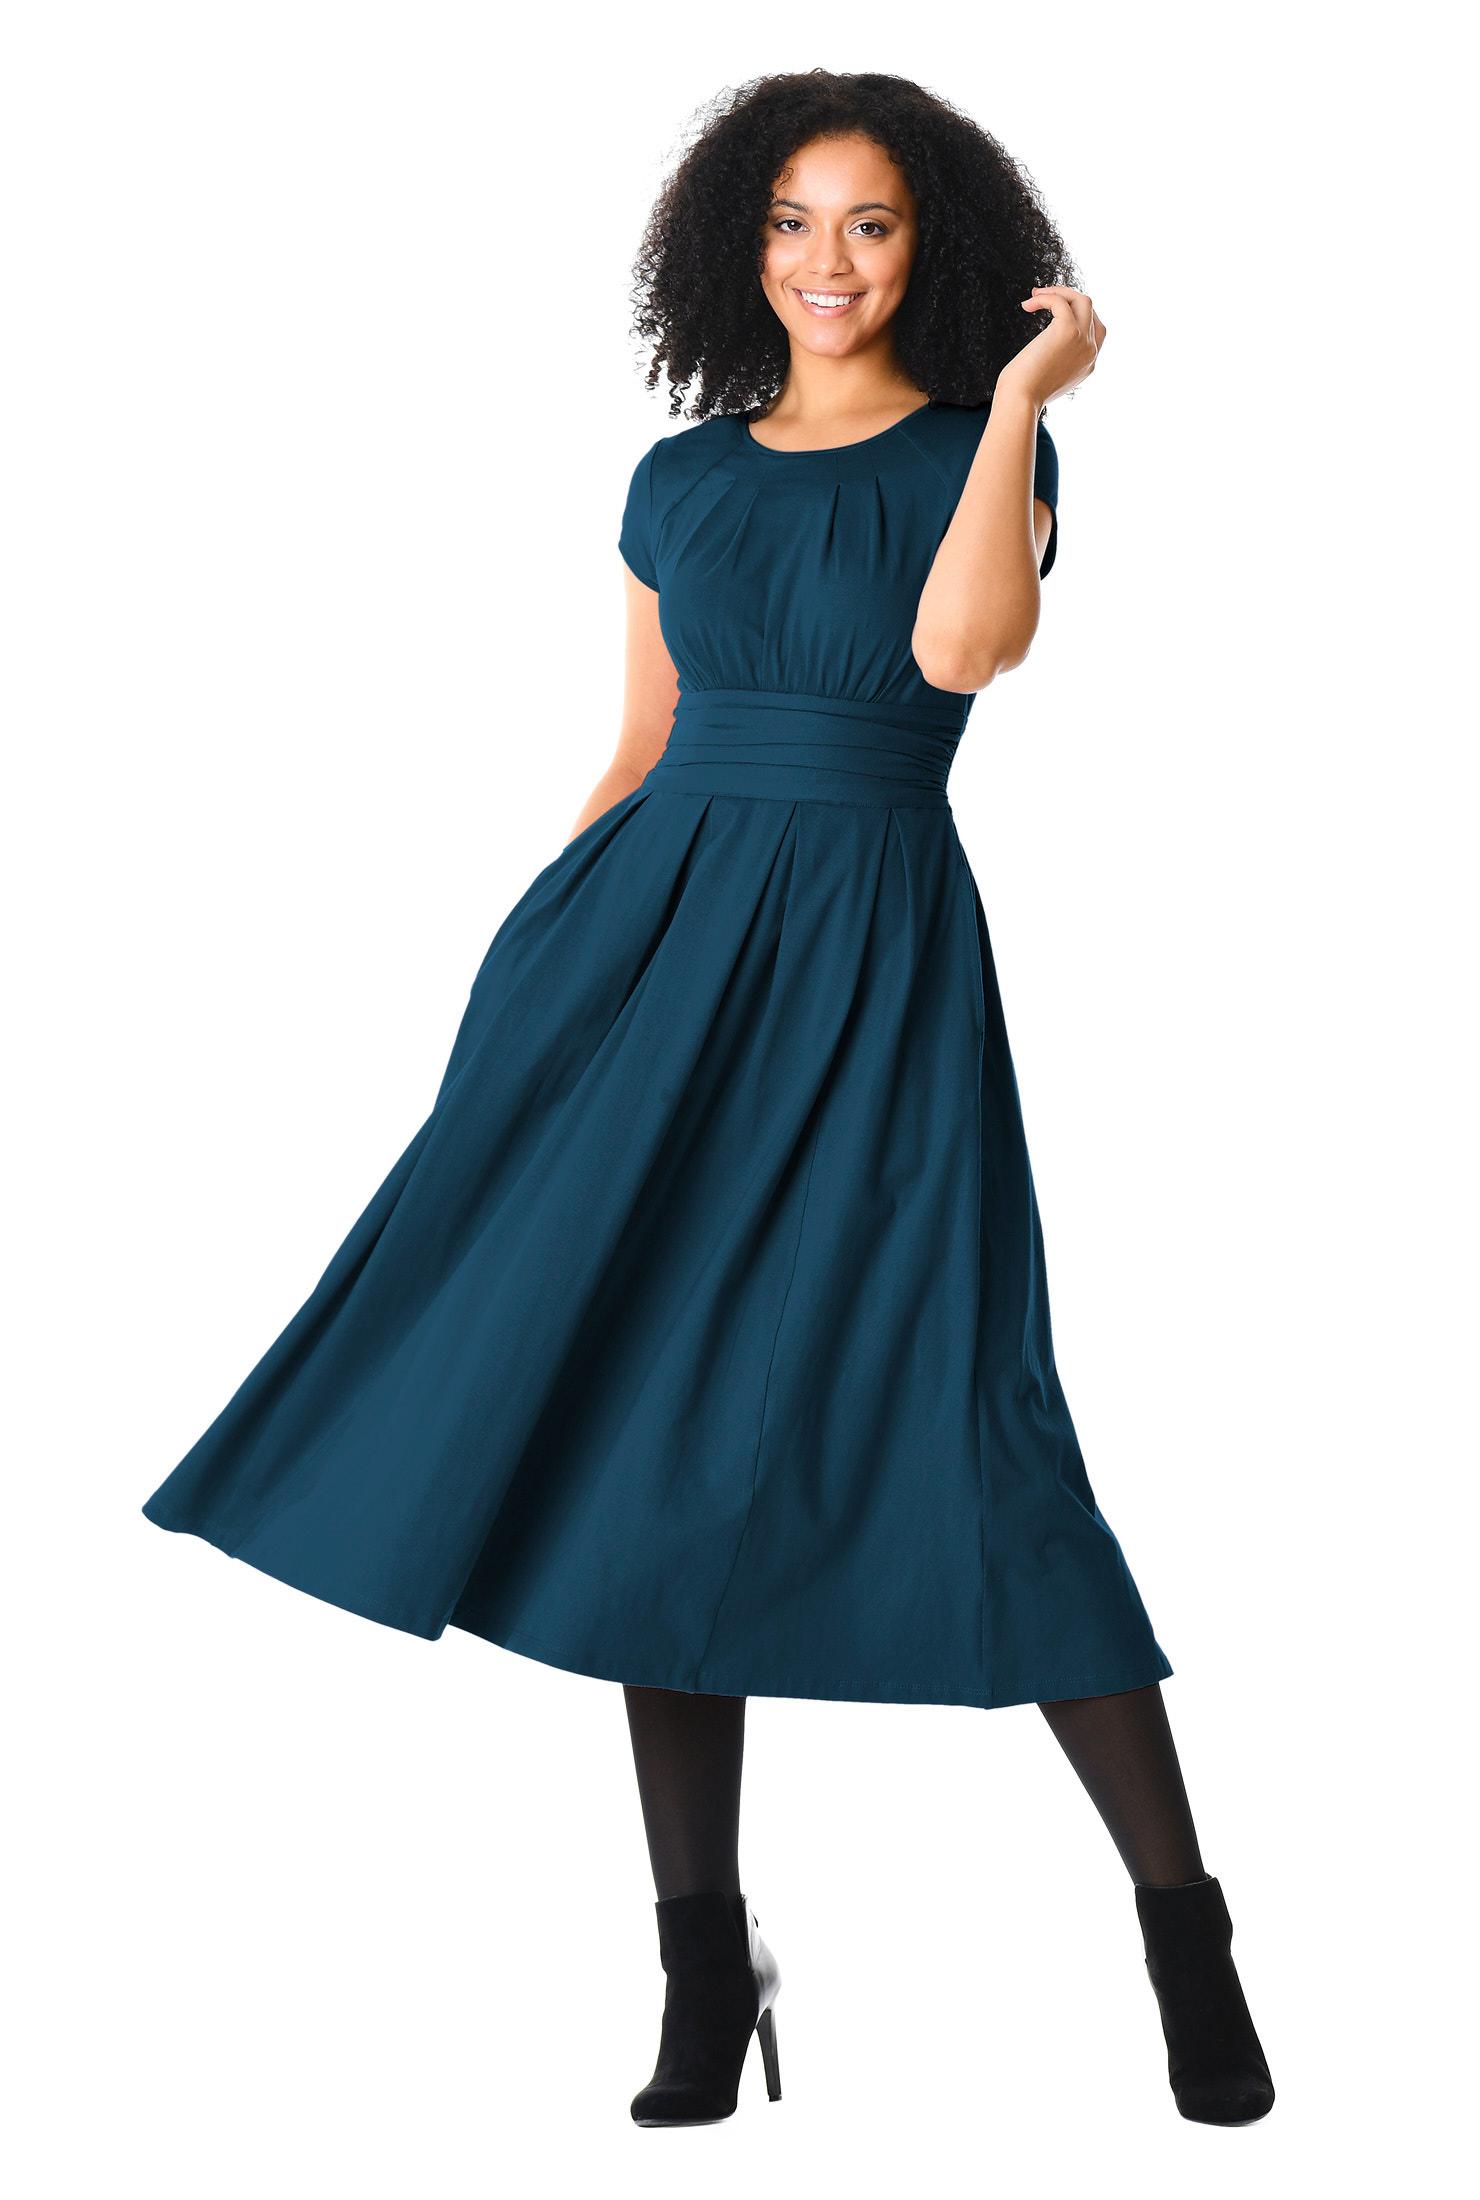 Women s Fashion Clothing 0-36W and Custom 0b69f6c57918